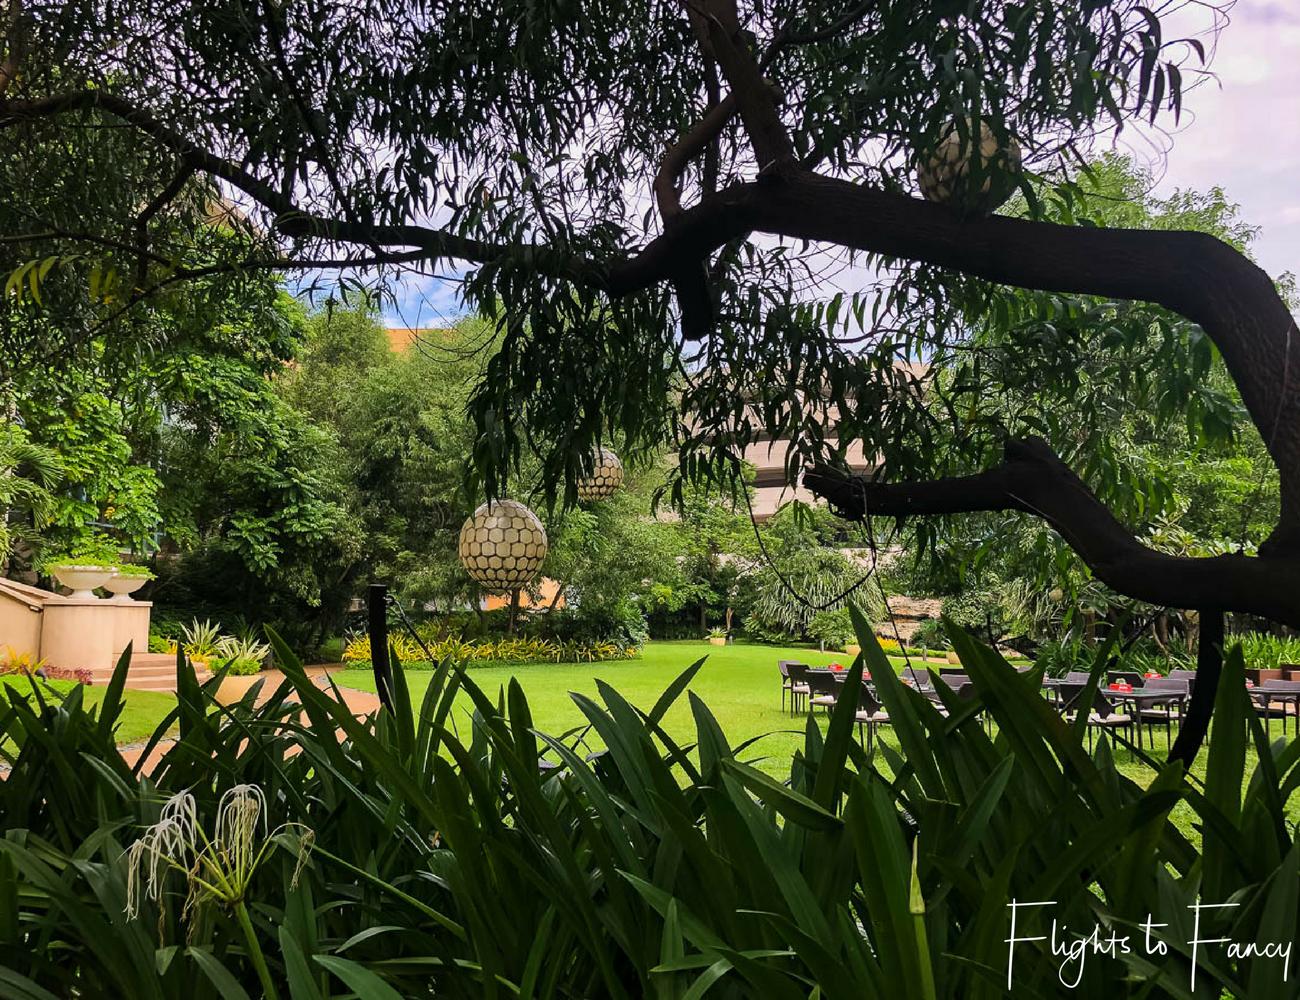 Flights To Fancy @ Radisson Blu Cebu City. Secret garden in a 5 star hotel in Cebu